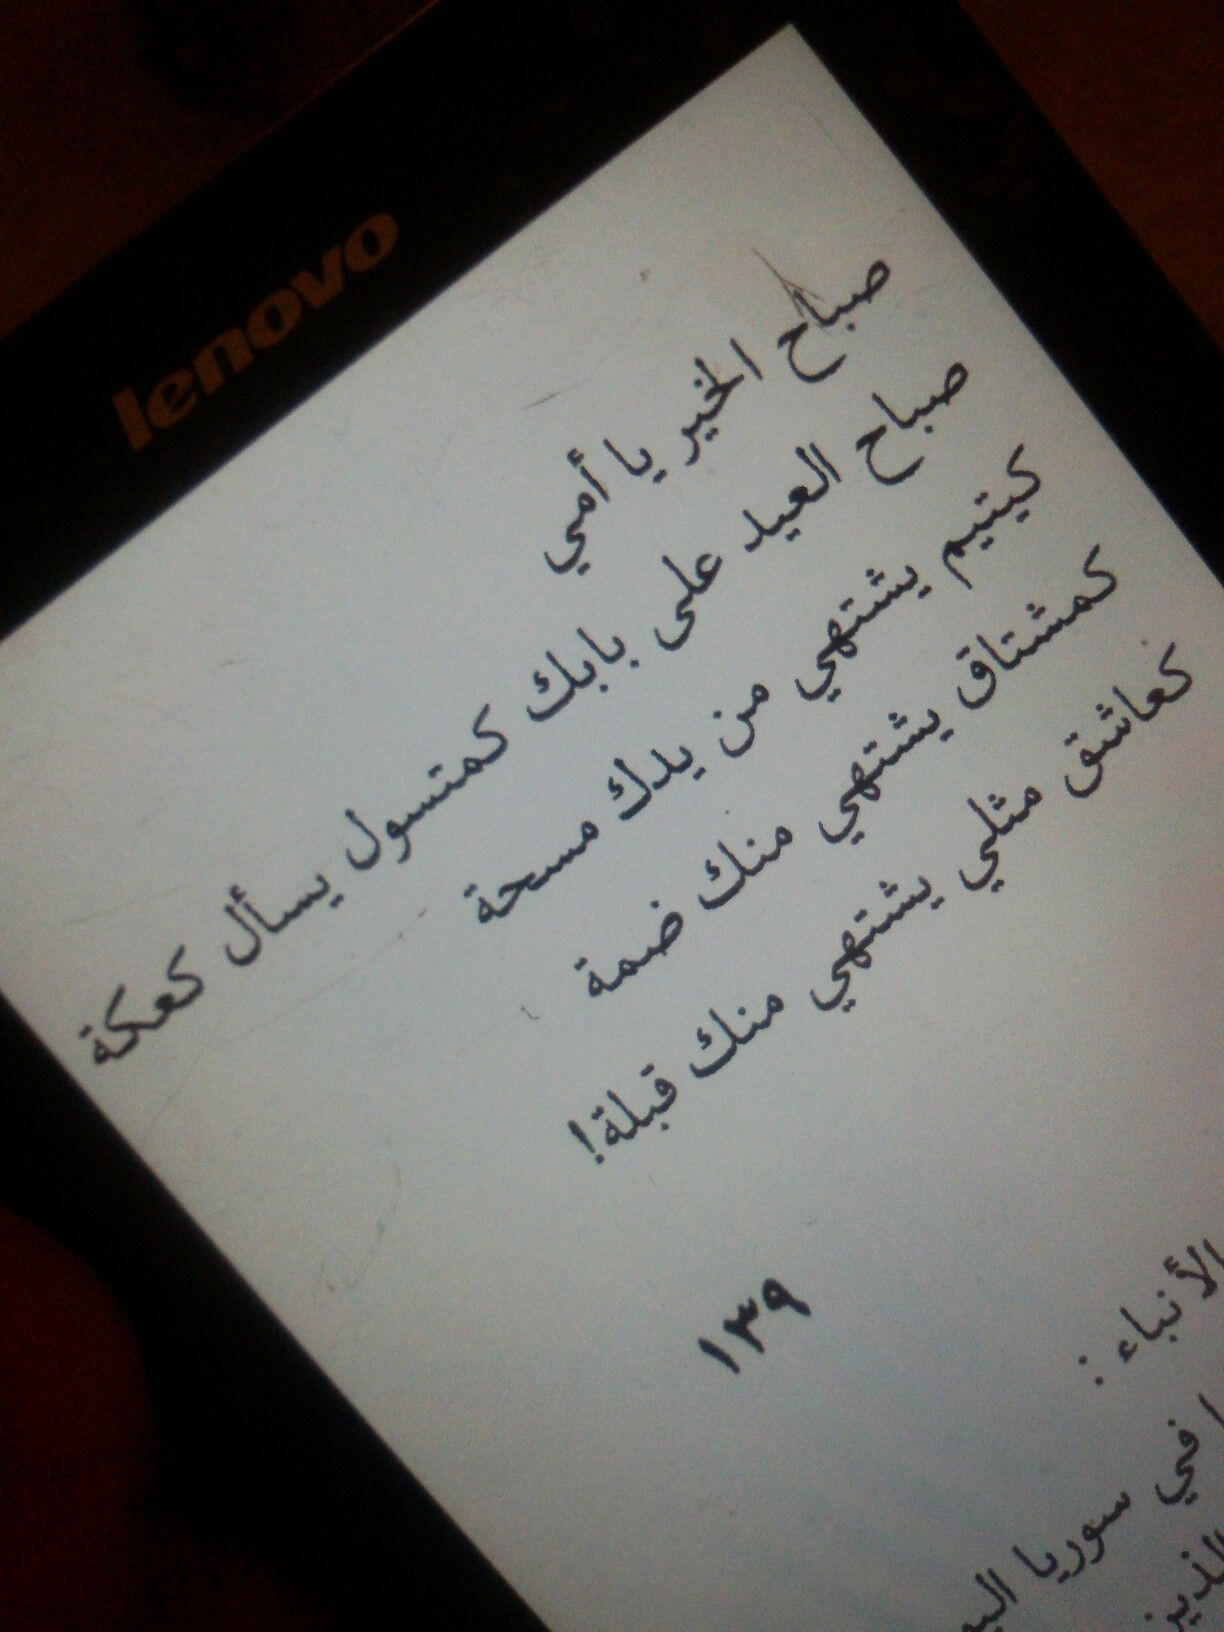 رحمك الله امي اللهم ارحمها واغفر لها Arabic Quotes Quotes Sayings